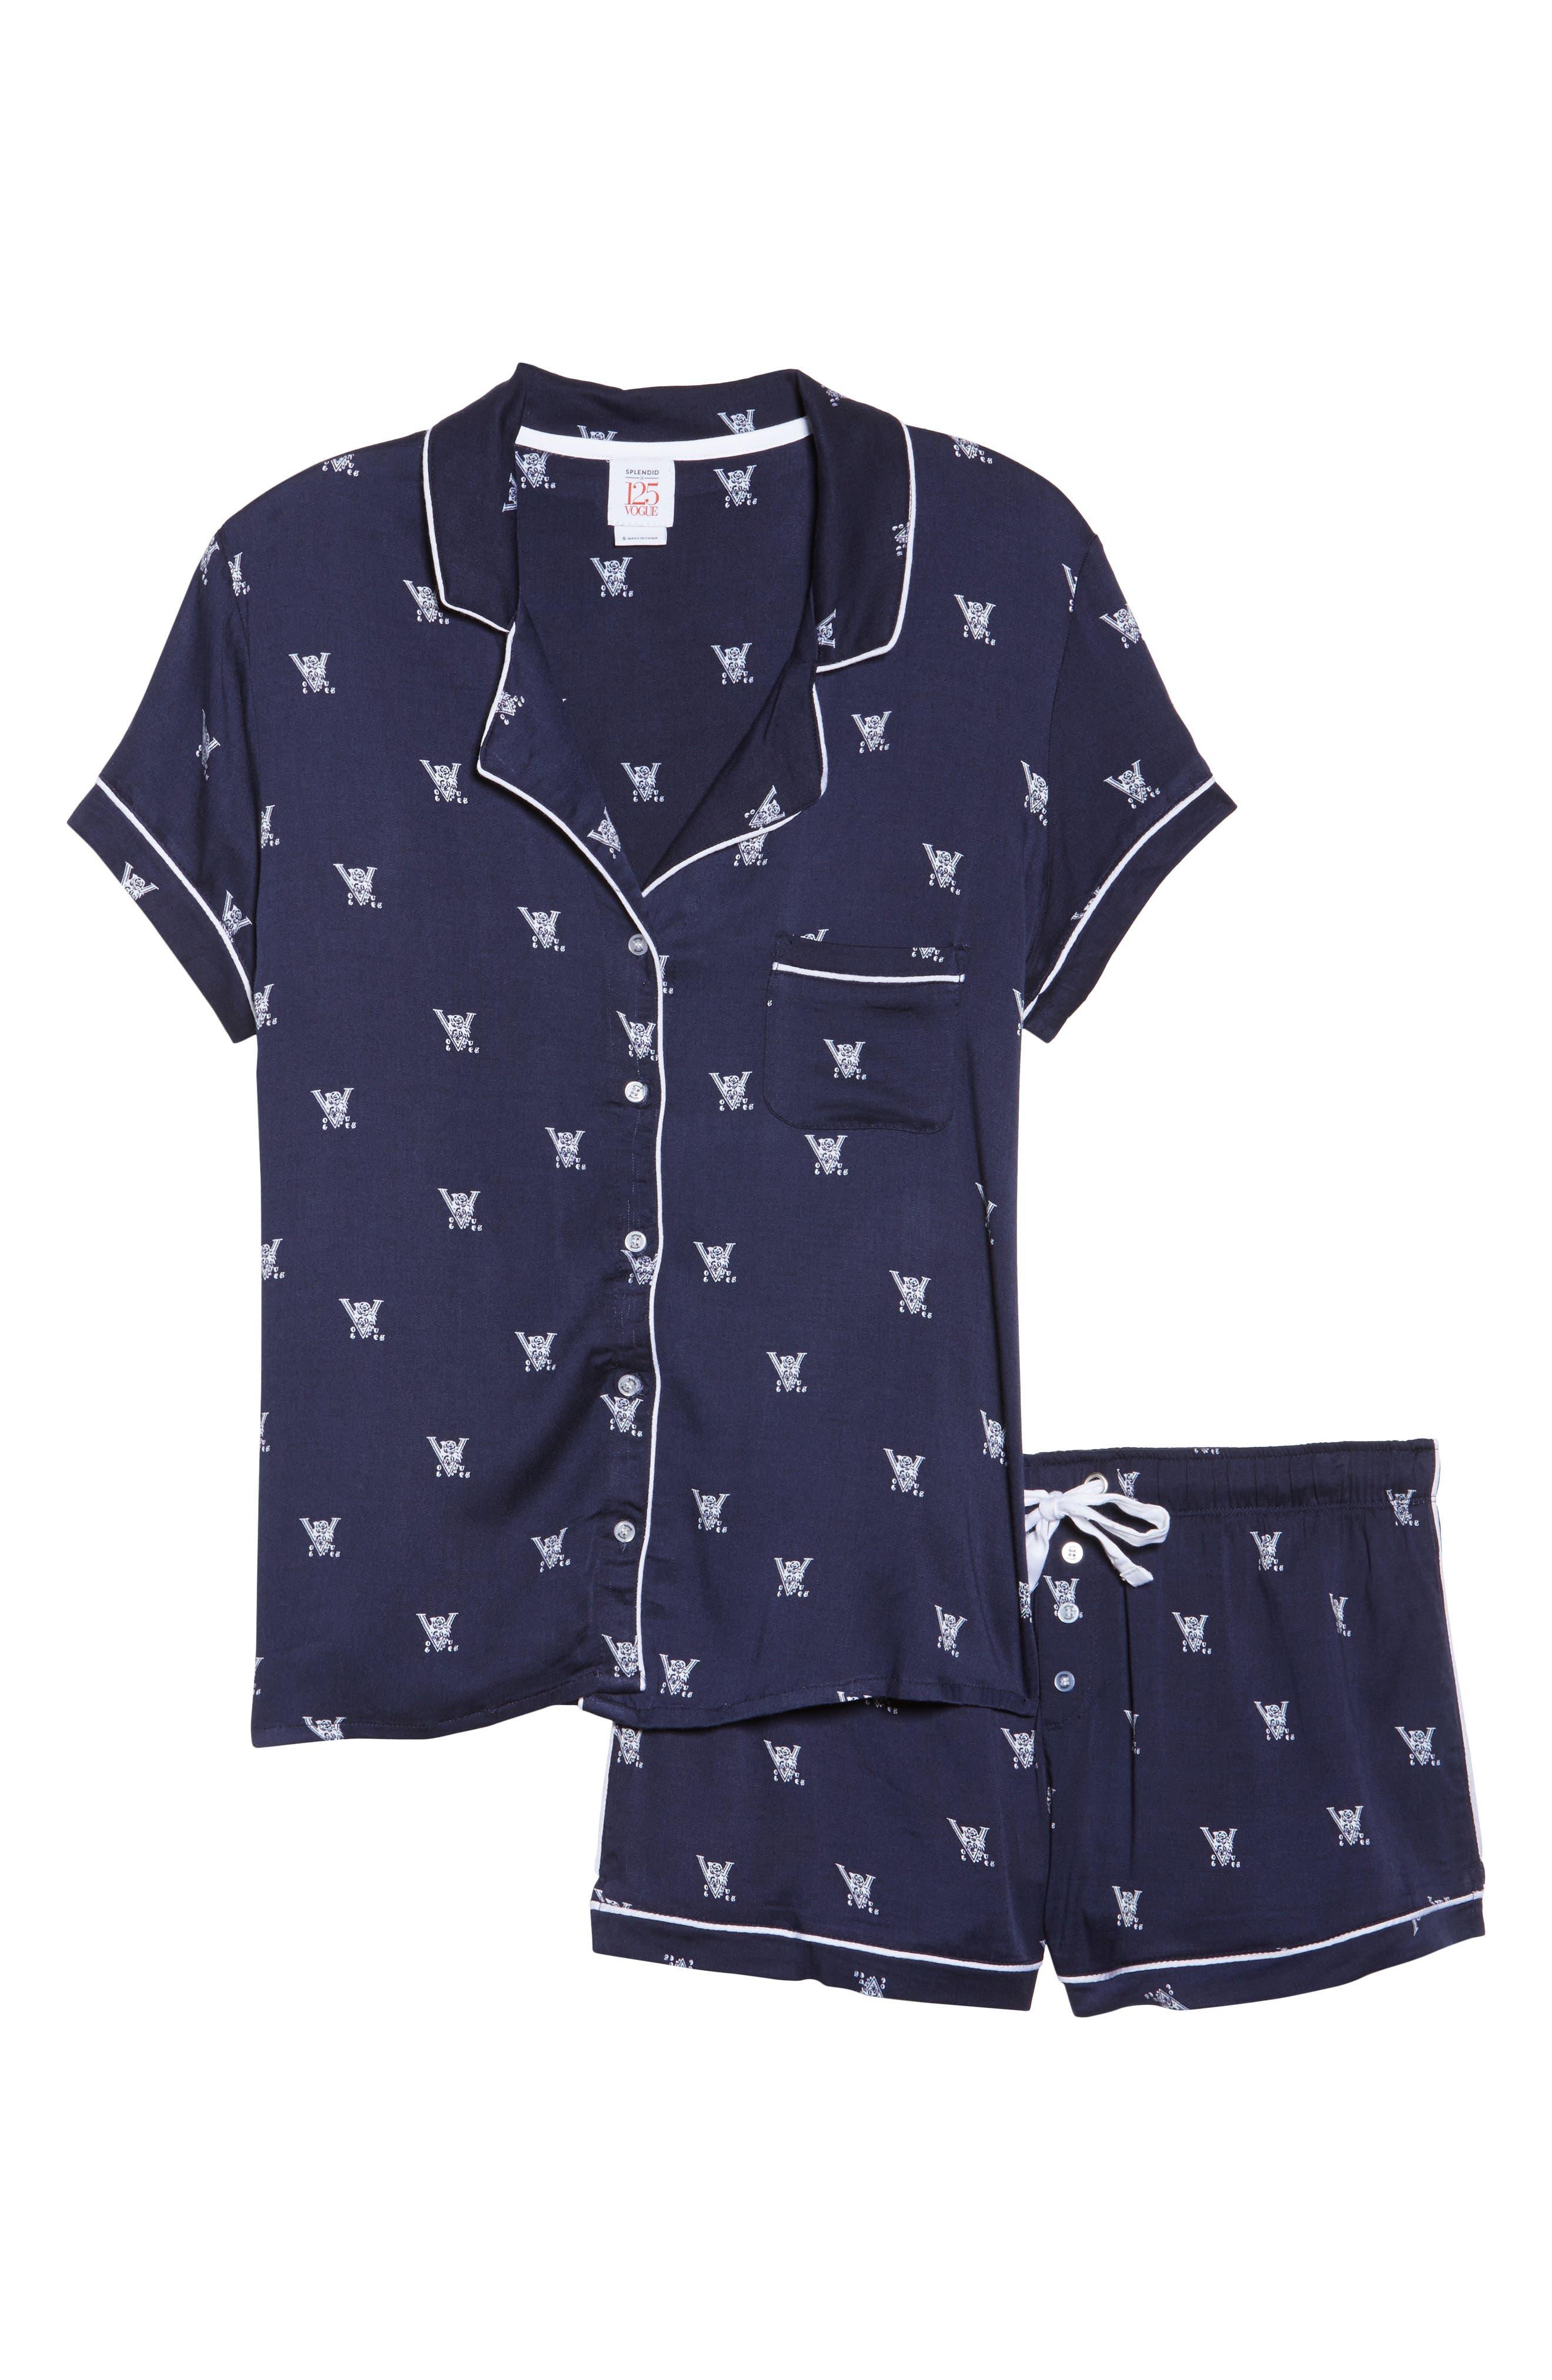 Shortie Pajamas,                             Alternate thumbnail 11, color,